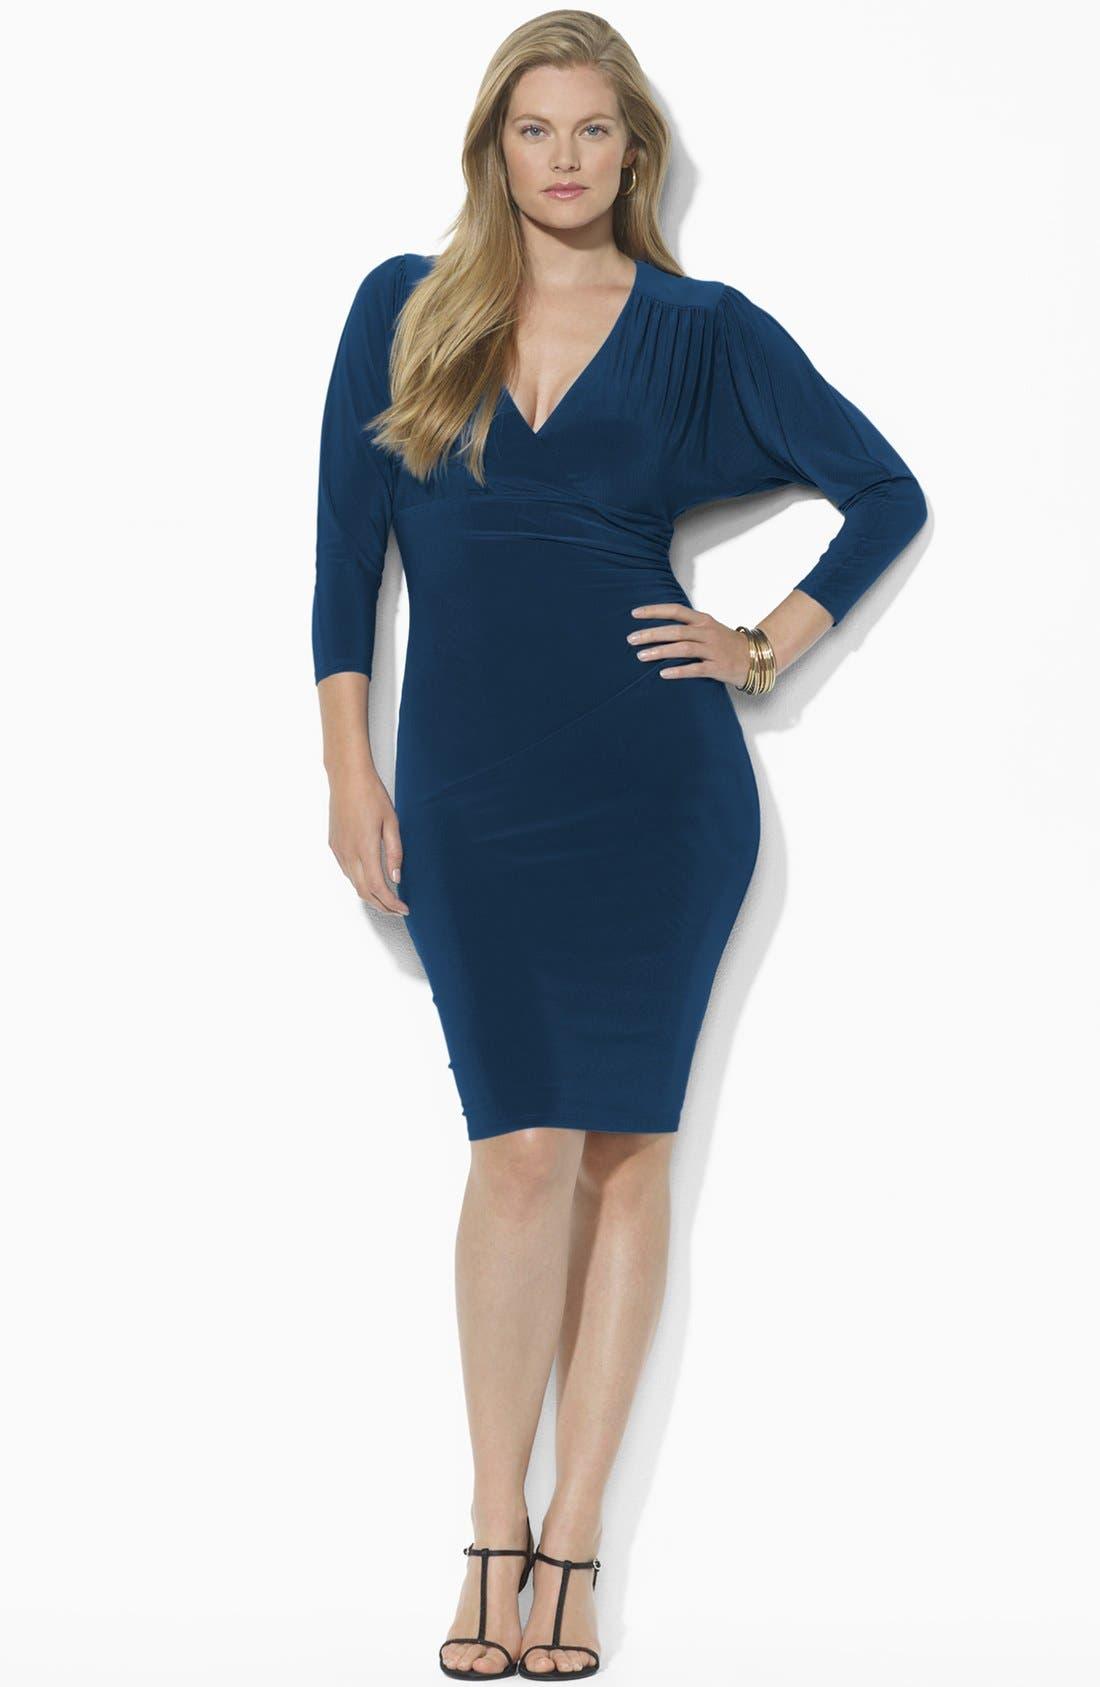 Alternate Image 1 Selected - Lauren Ralph Lauren Draped Jersey Dress (Plus) (Online Only)